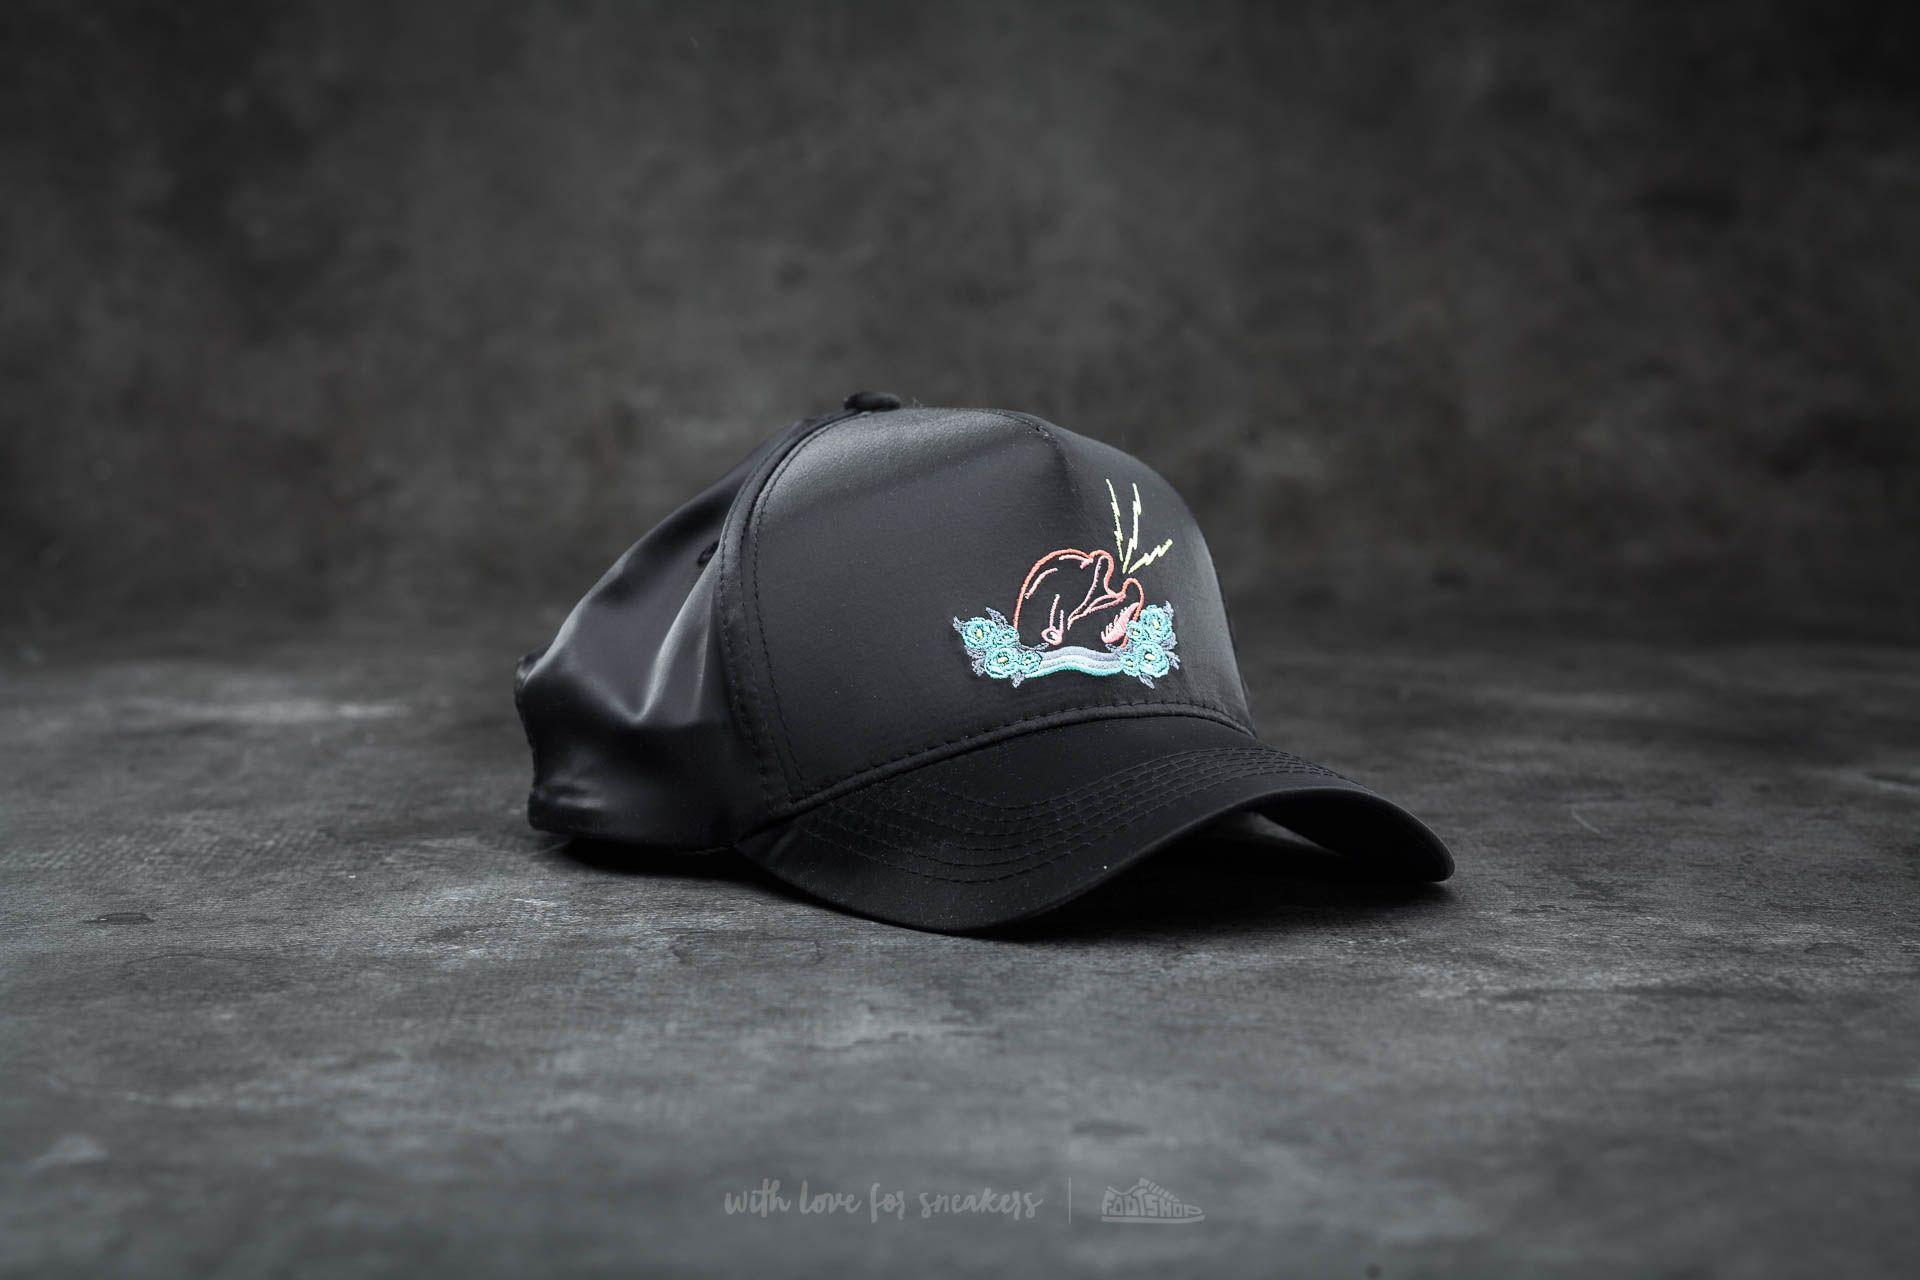 Pink Dolphin Souvenir Satin Snapback Black - 14910